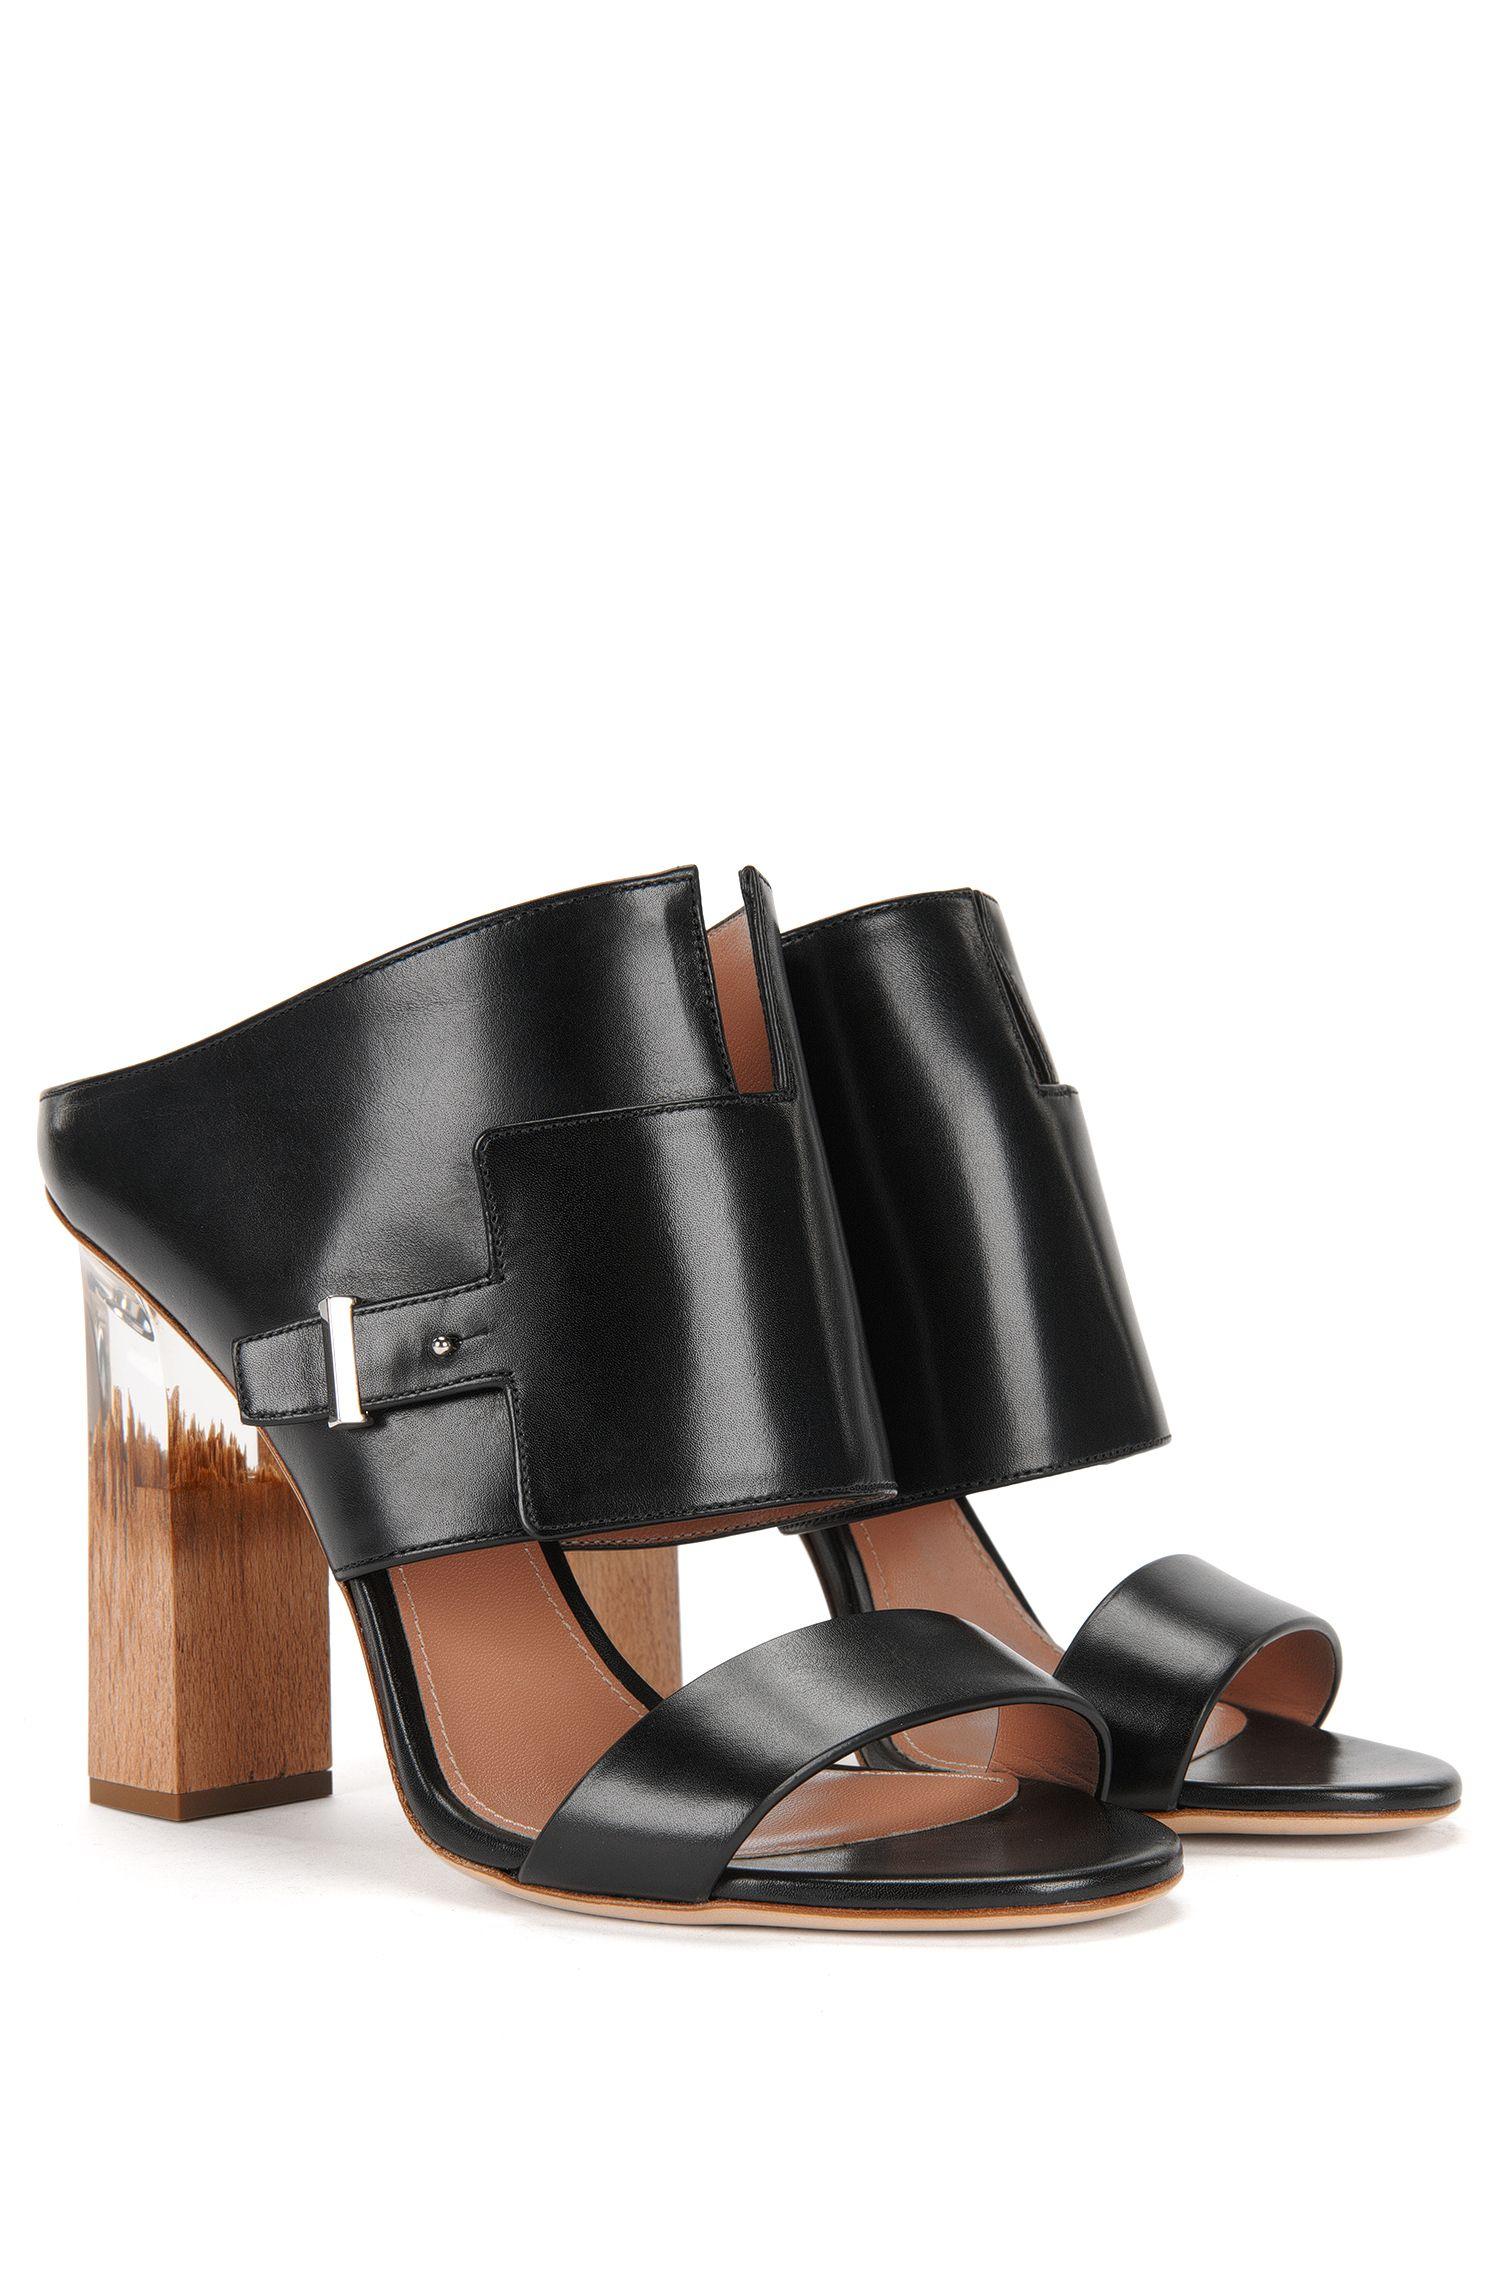 'Bespoke Pin Sandal' | Italian Calfskin Resin Heel Sandals